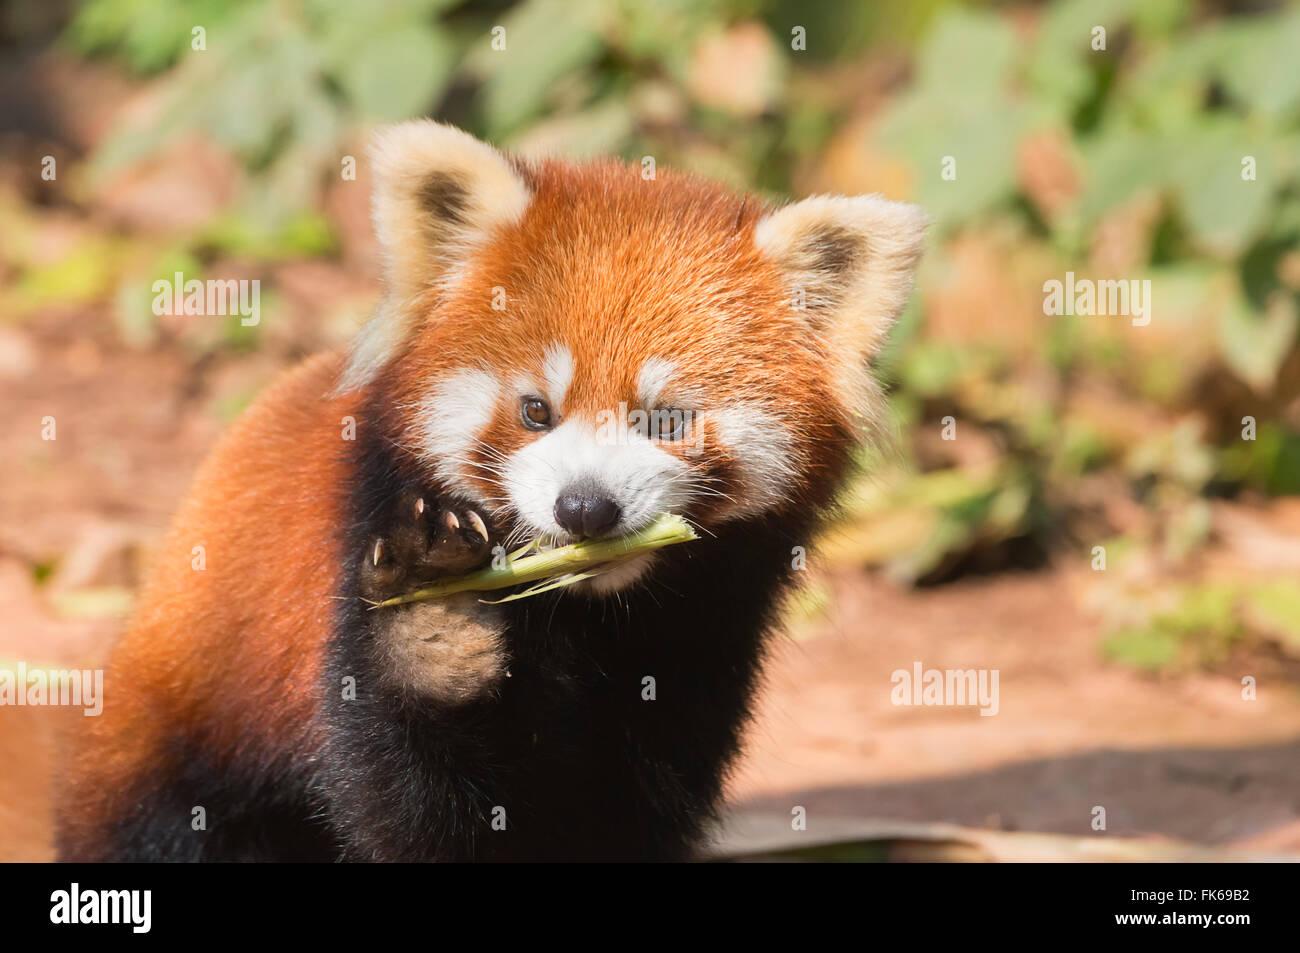 Le panda rouge (Ailurus fulgens), province du Sichuan, Chine, Asie Photo Stock